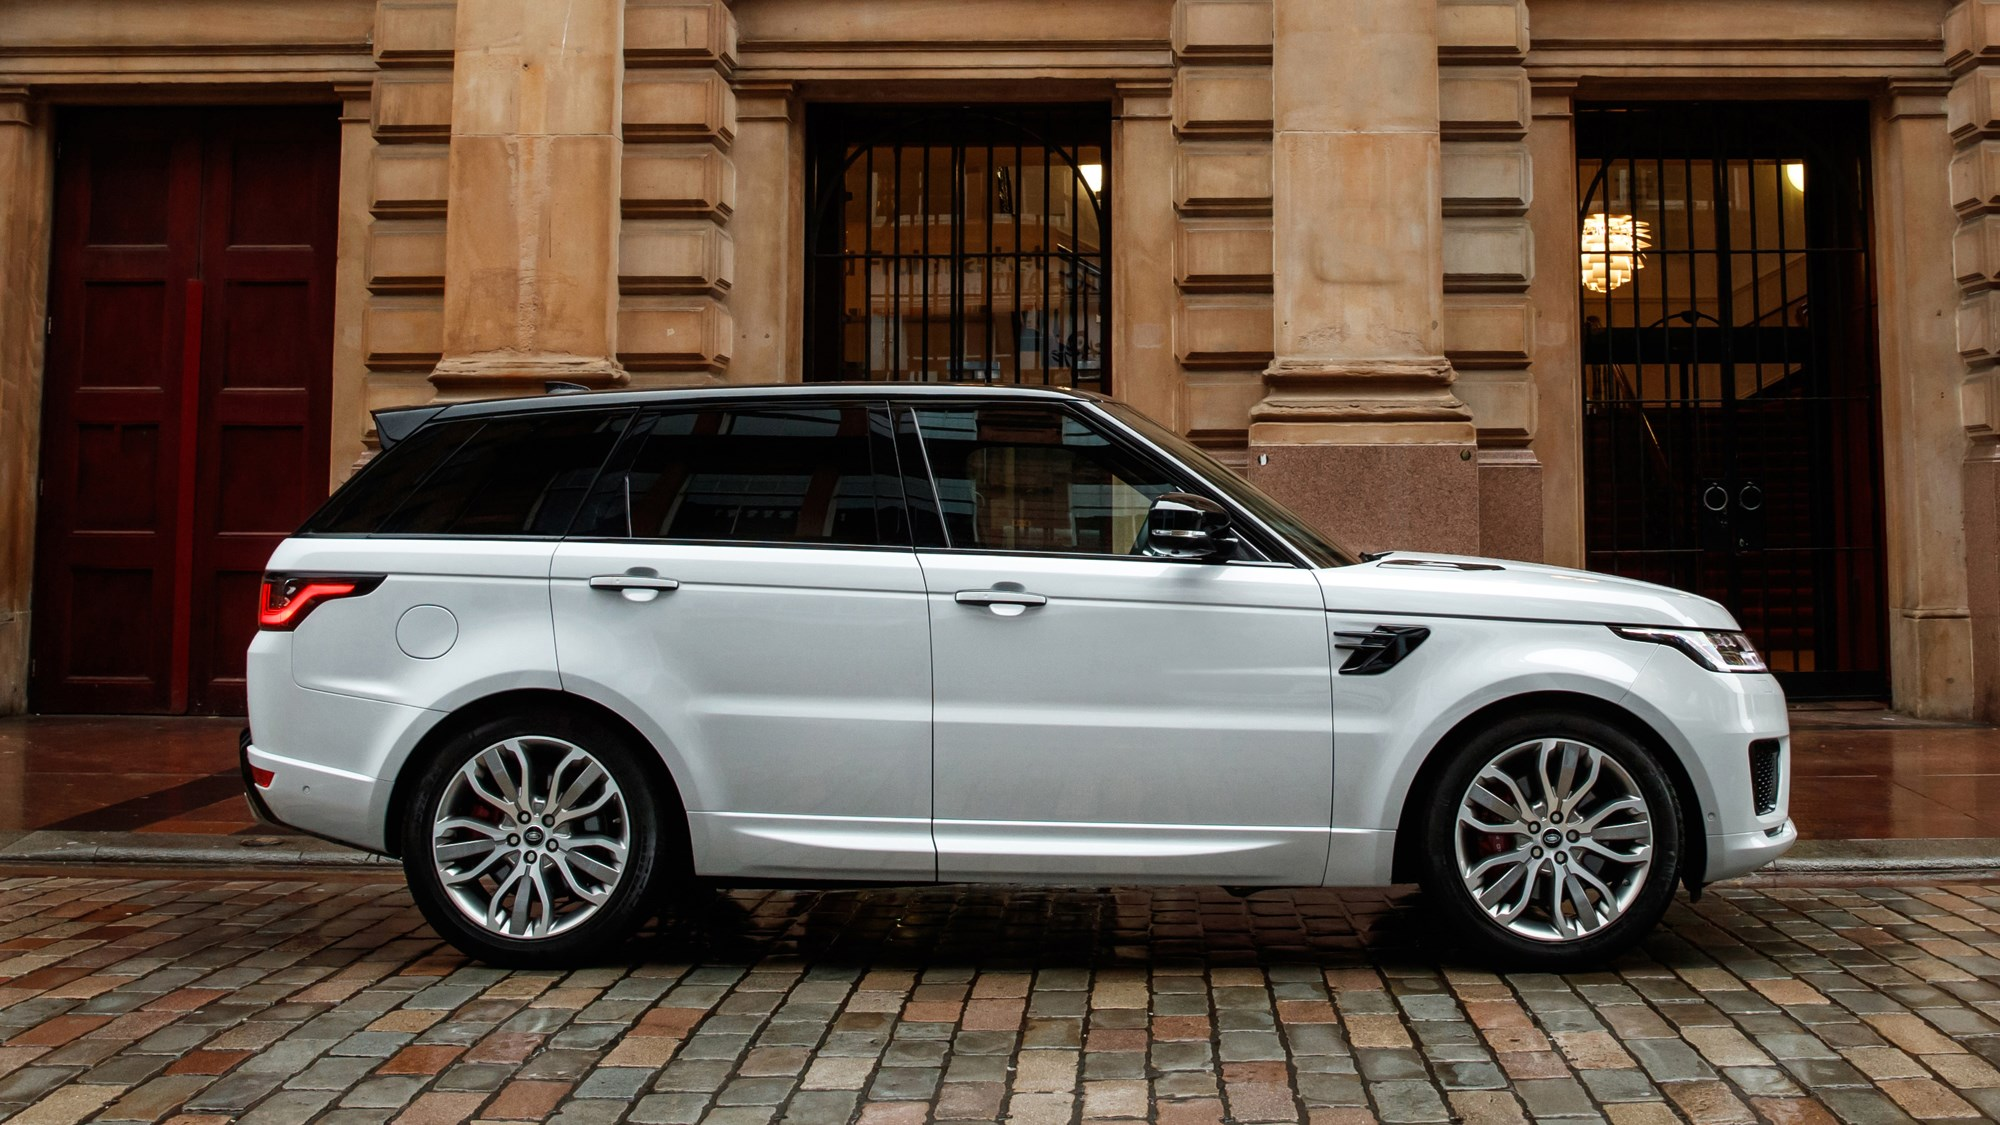 White Land Rover Range Rover Sport D350 side elevation